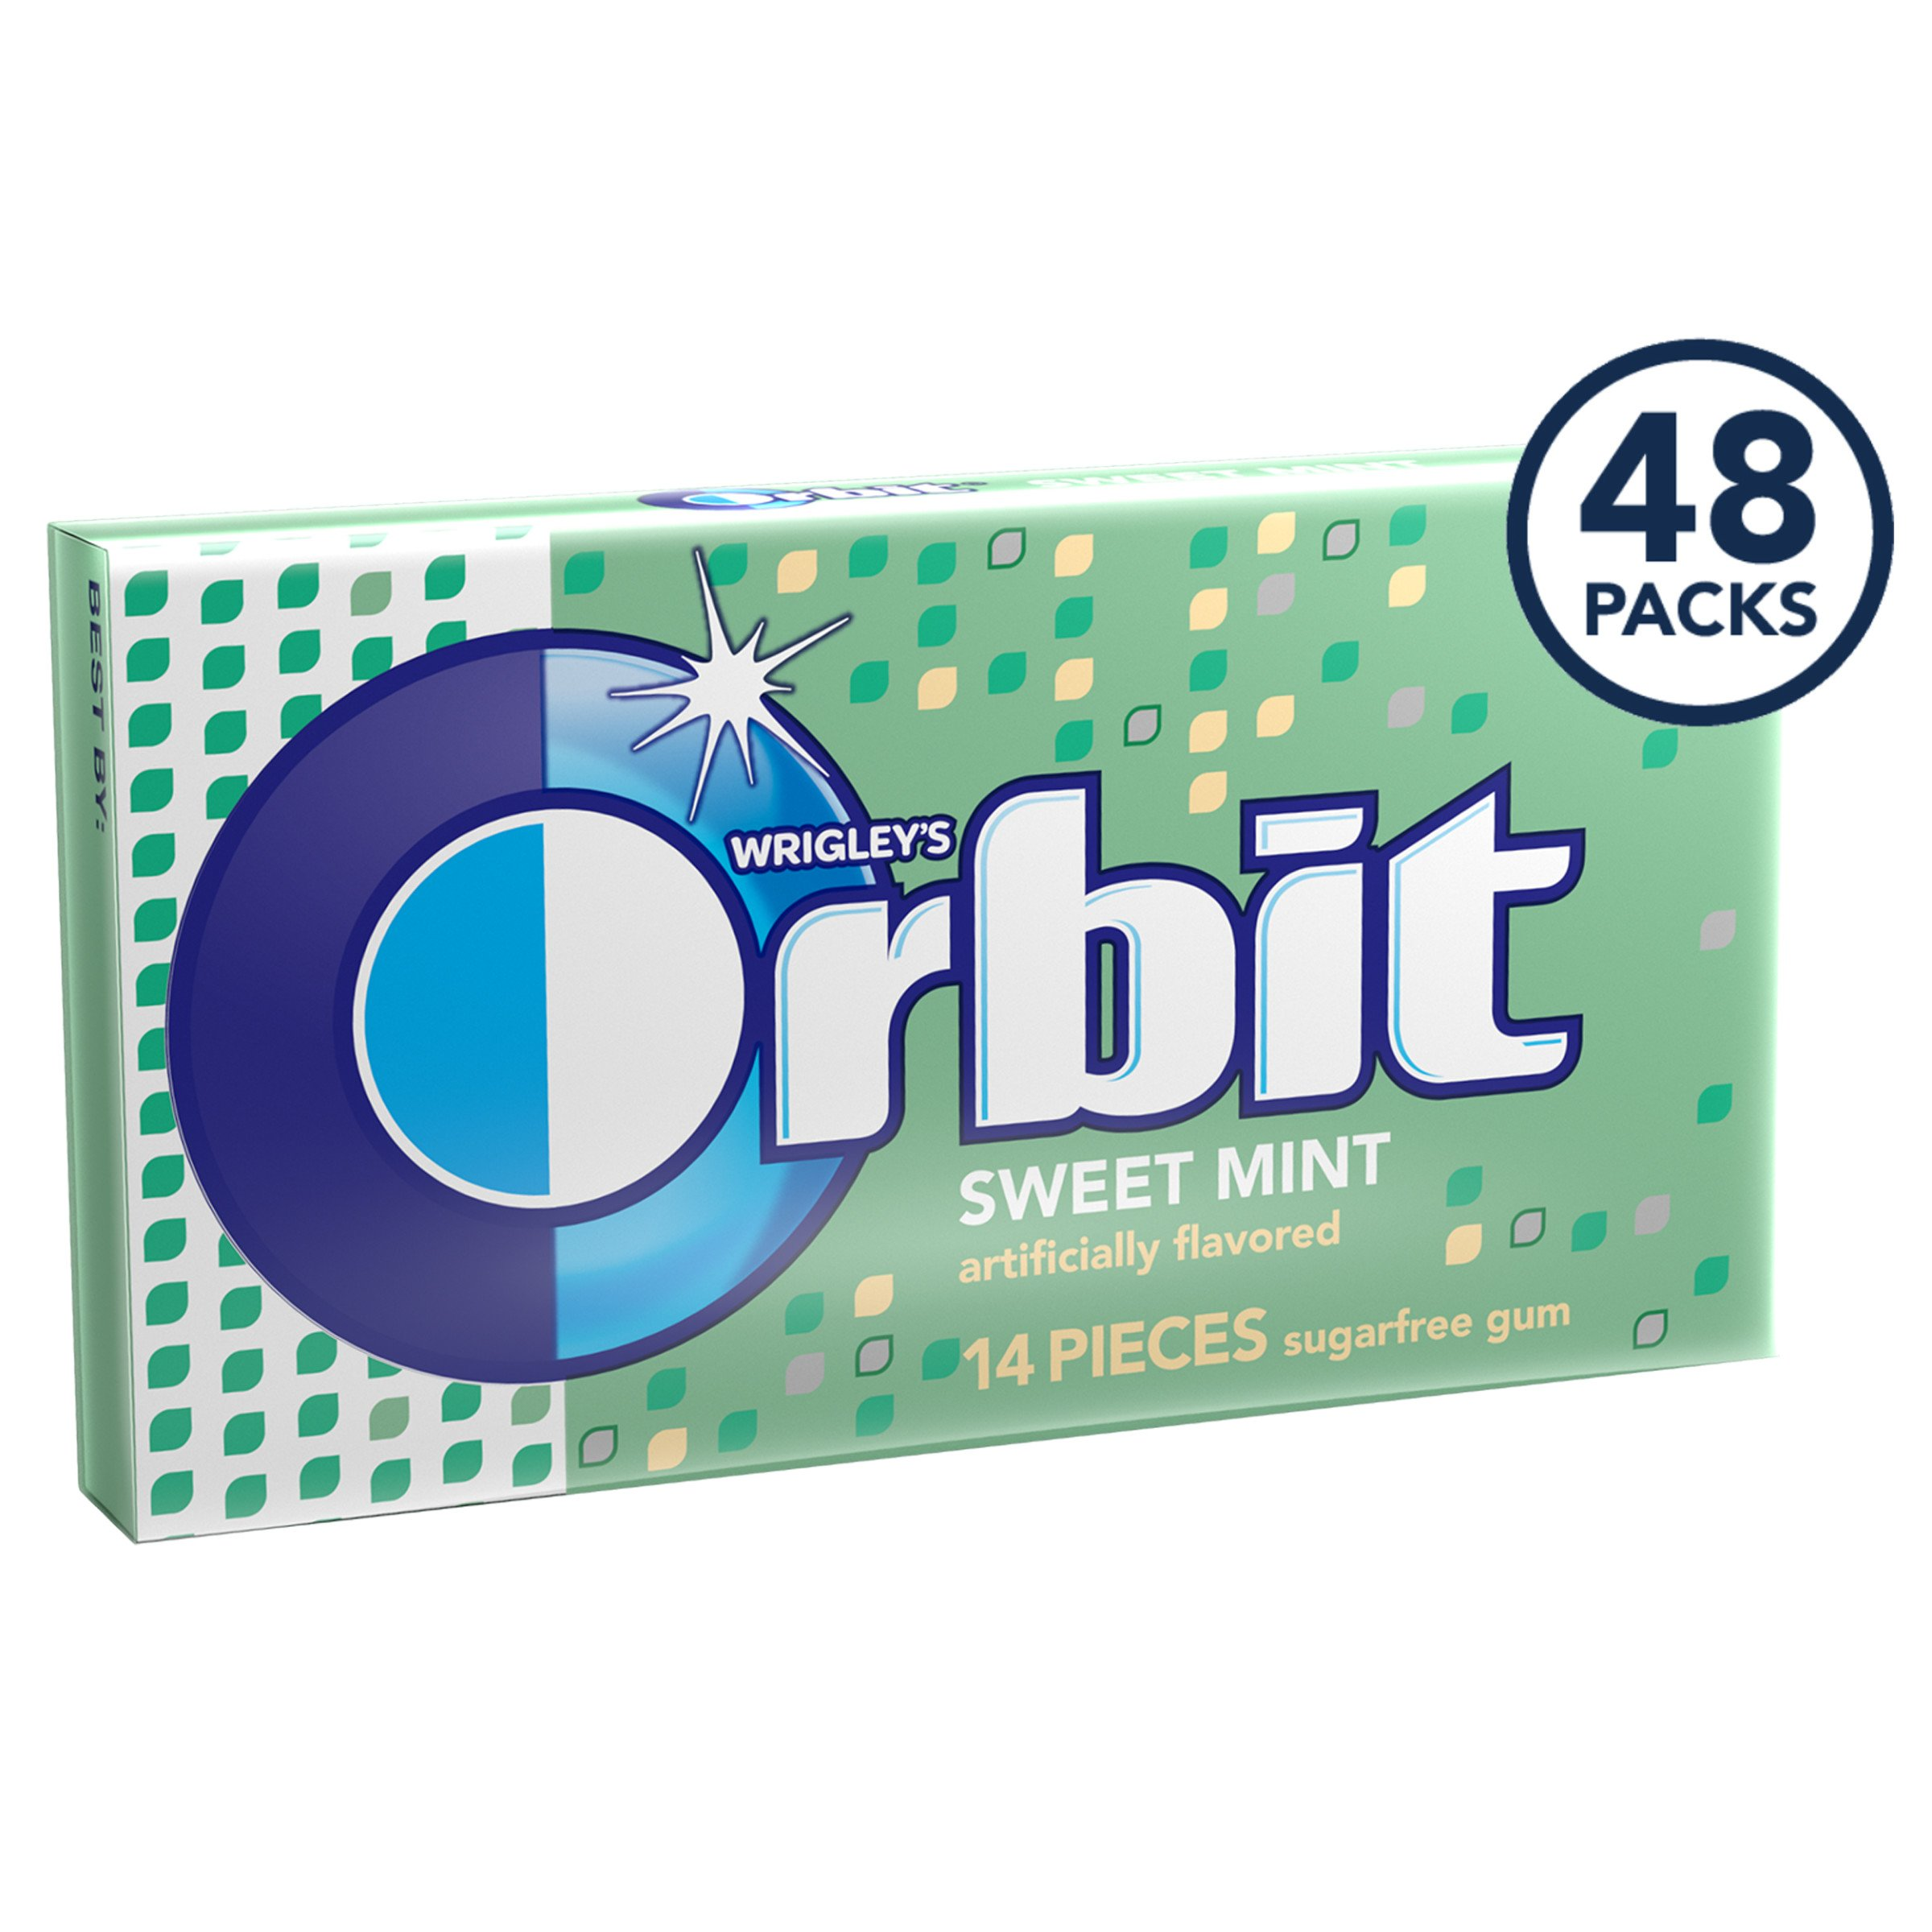 Orbit Sweet Mint Sugarfree Gum, 8 Count (Pack of 6) by Orbit Gum (Image #2)